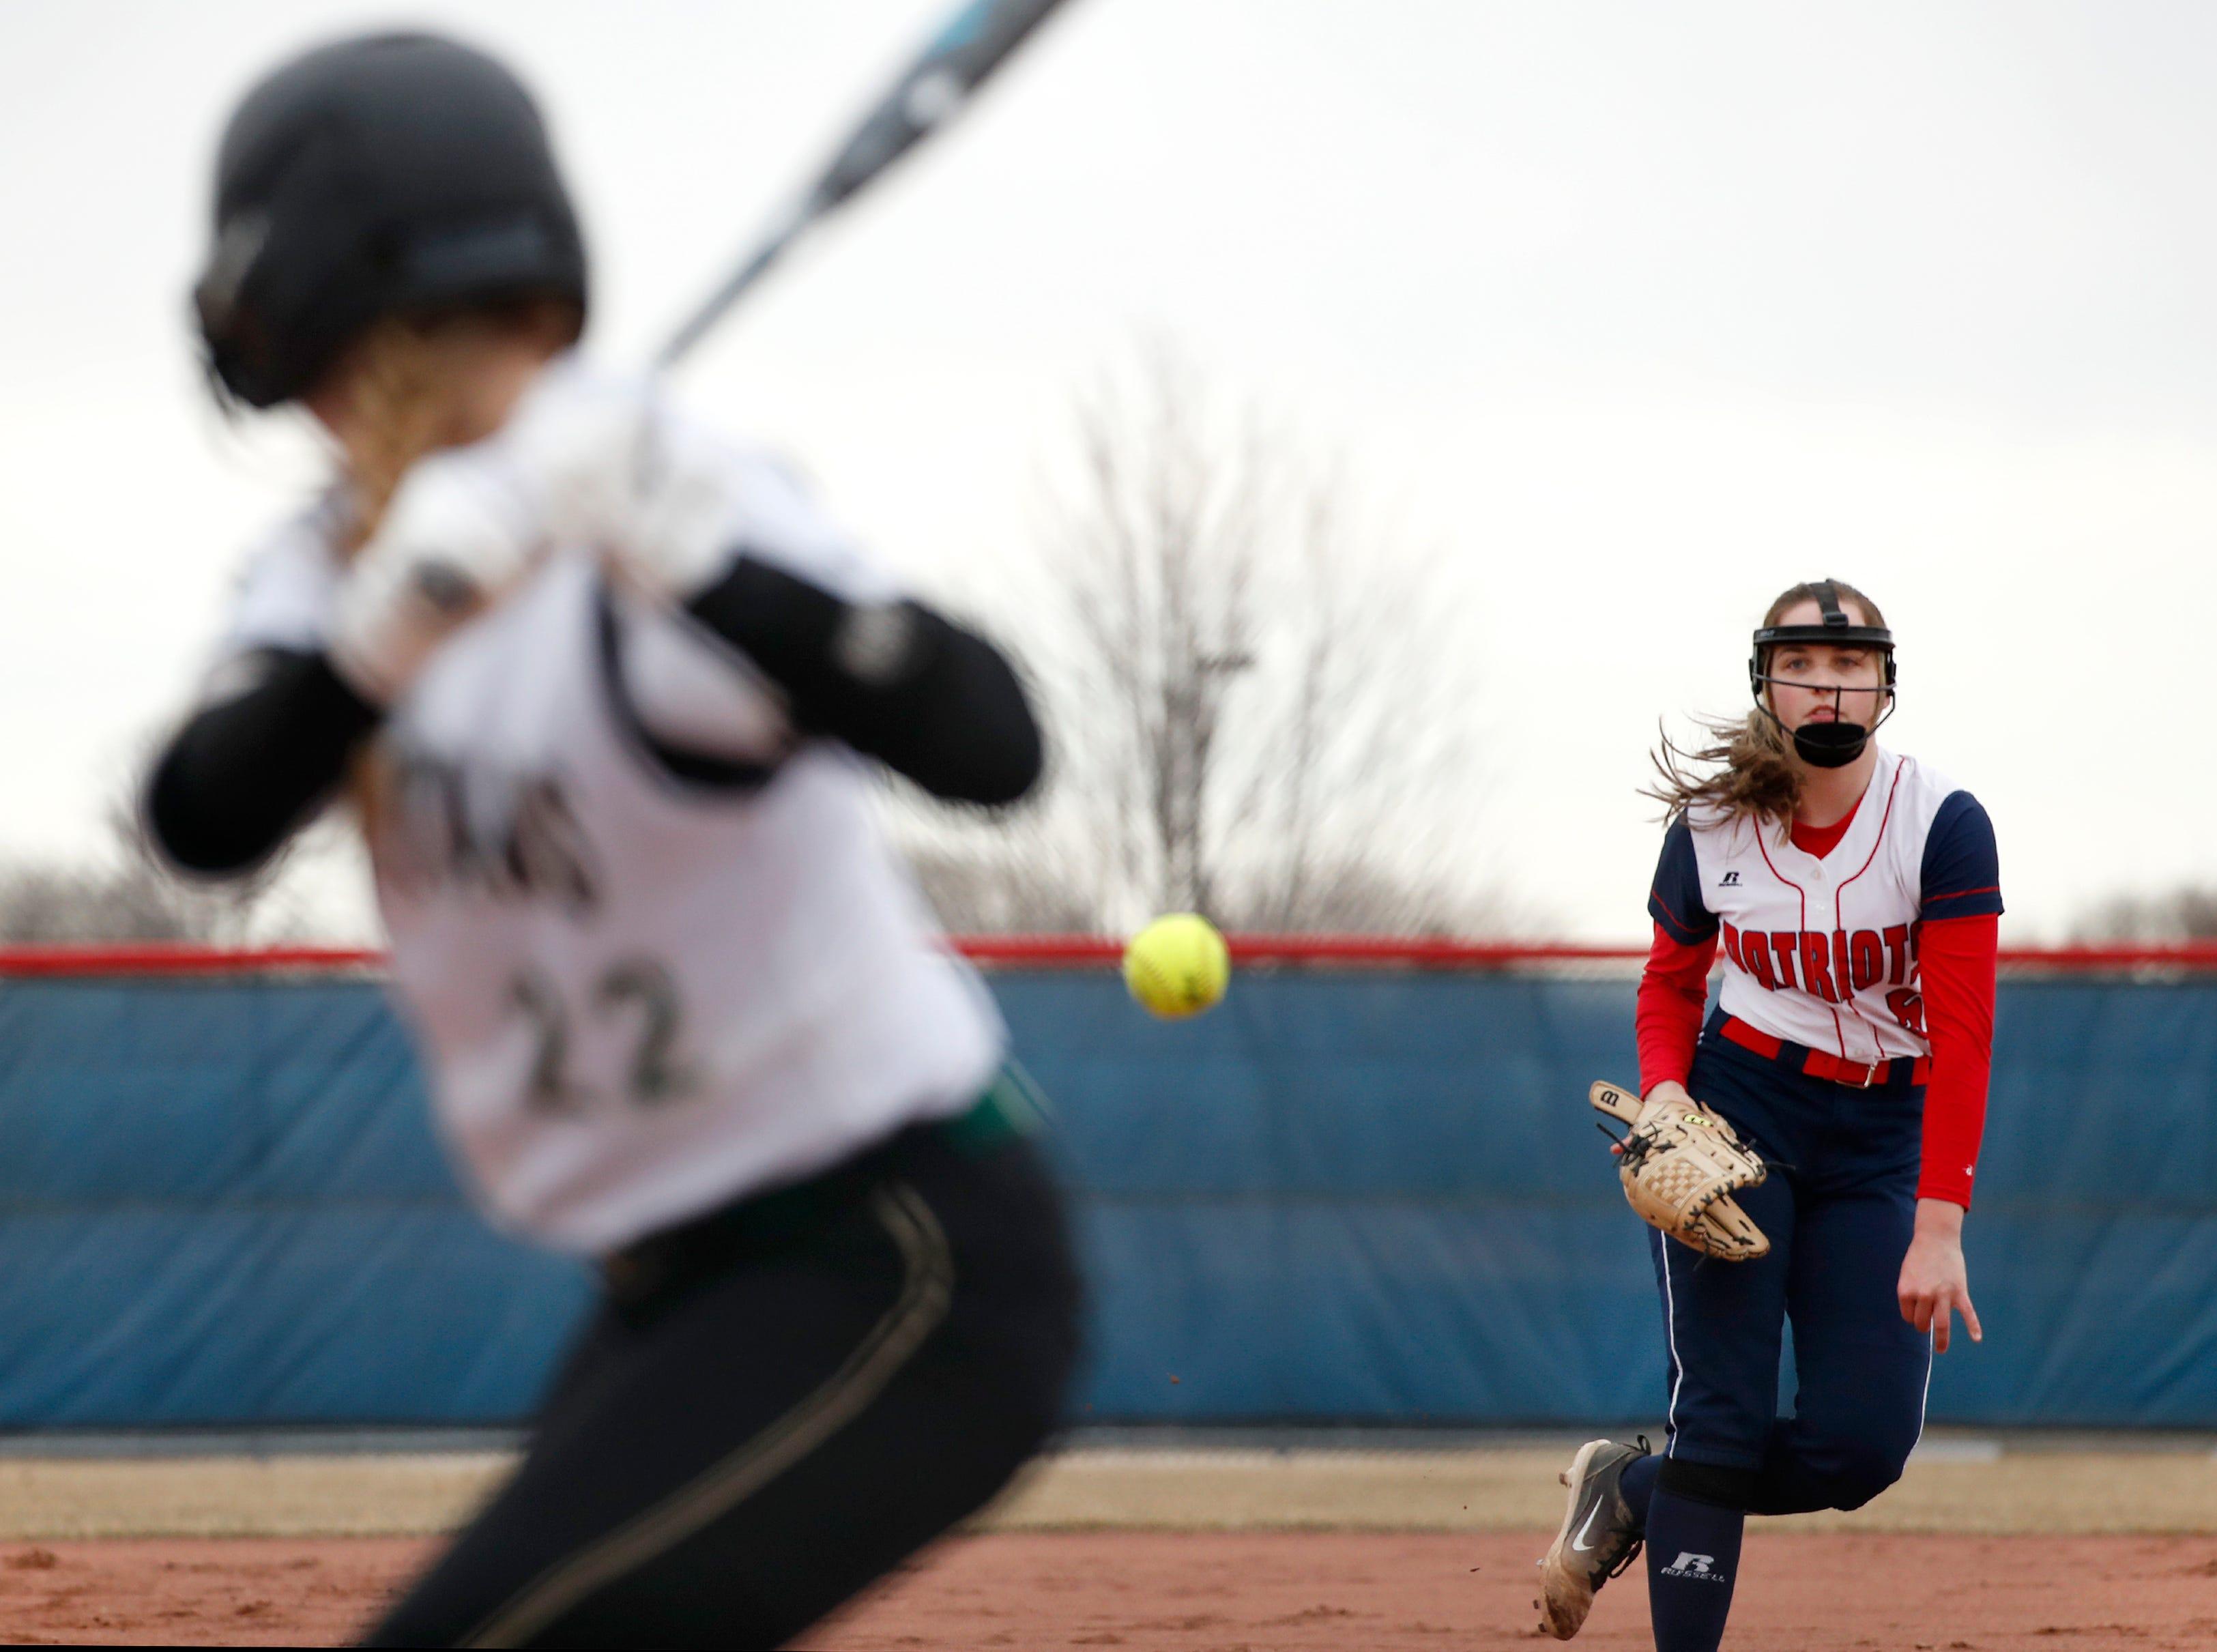 Appleton East High SchoolÕs Gwen Hendrick pitches at Oshkosh North High SchoolÕs Brooke Ellestad Thursday, April 4, 2019, in Appleton, Wis. Danny Damiani/USA TODAY NETWORK-Wisconsin